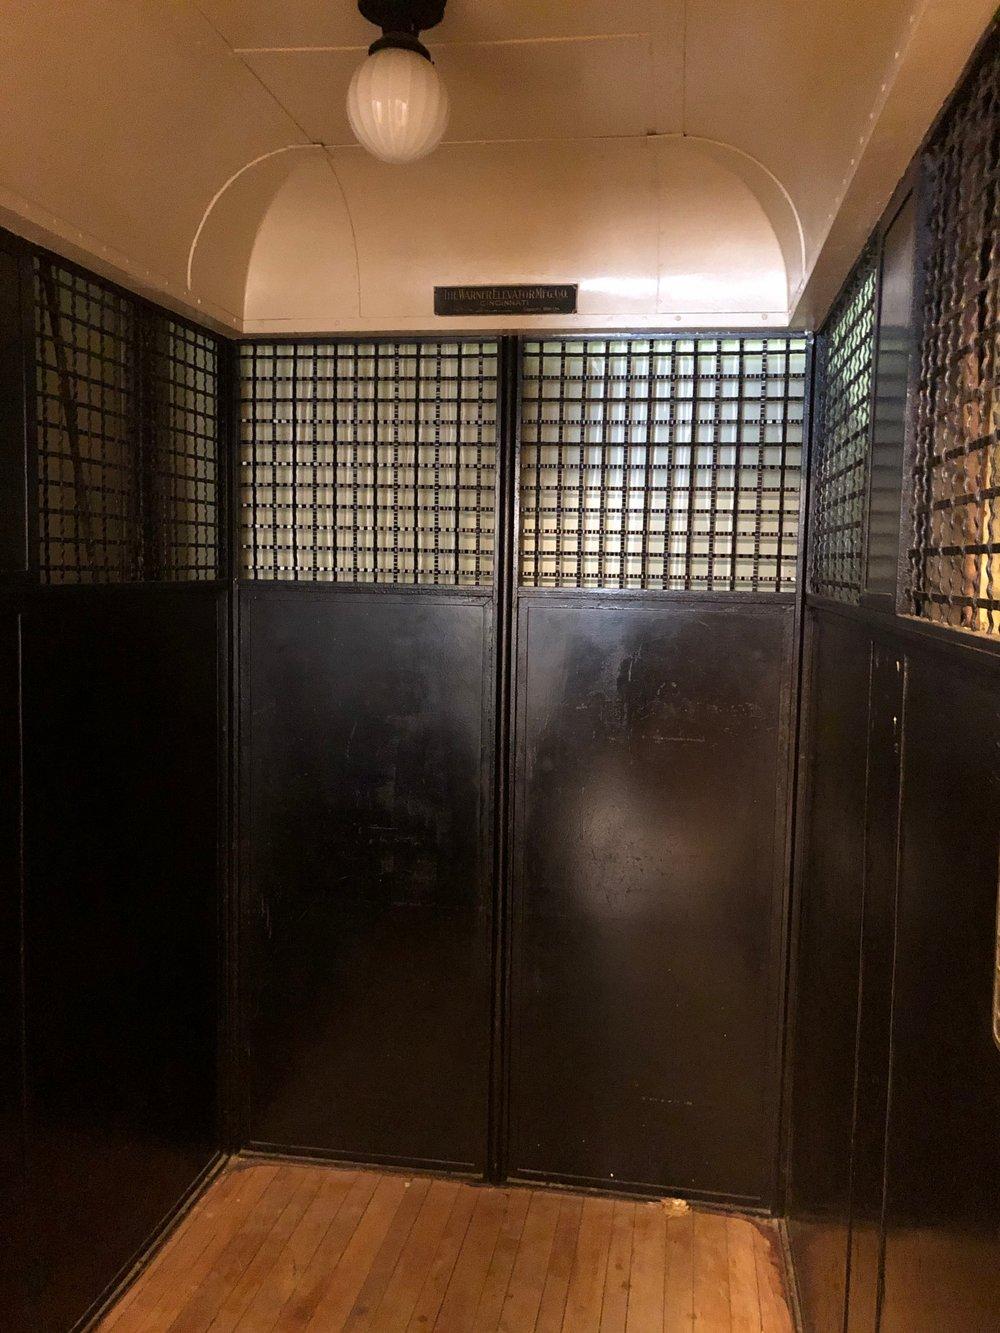 Elevator original to hospital. Still in working order.